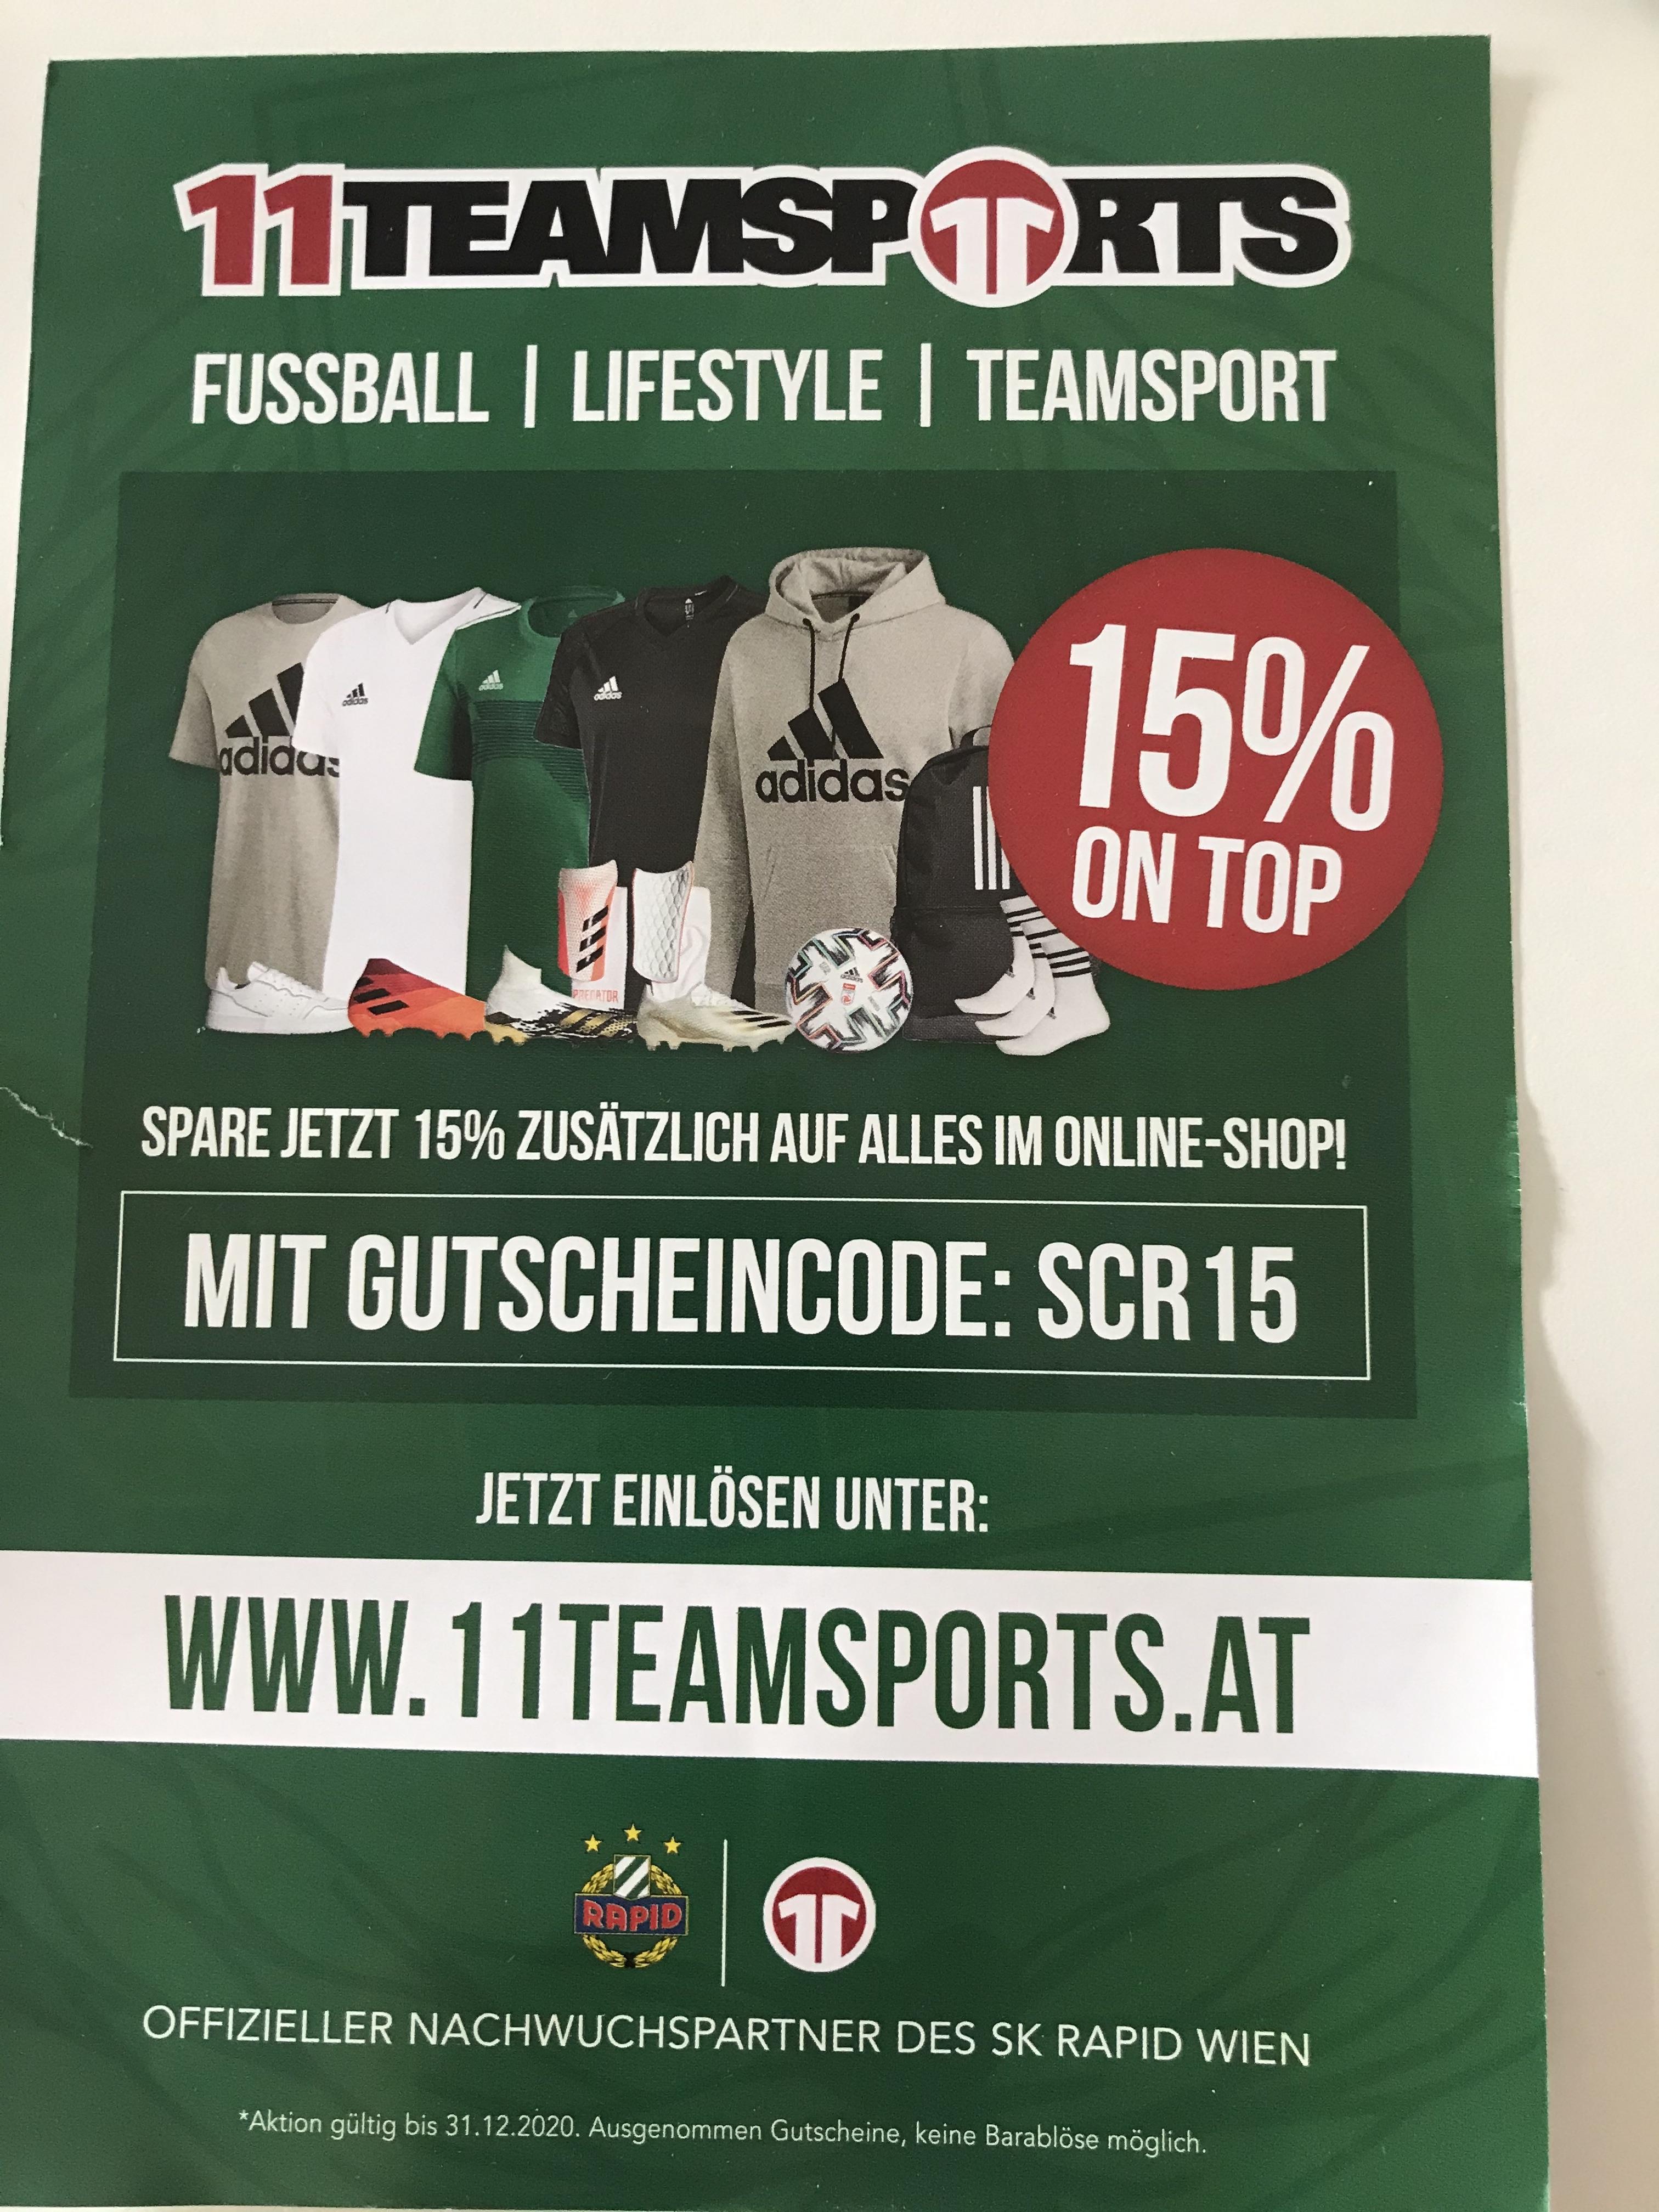 15% on Top auf alles bei 11teamsports